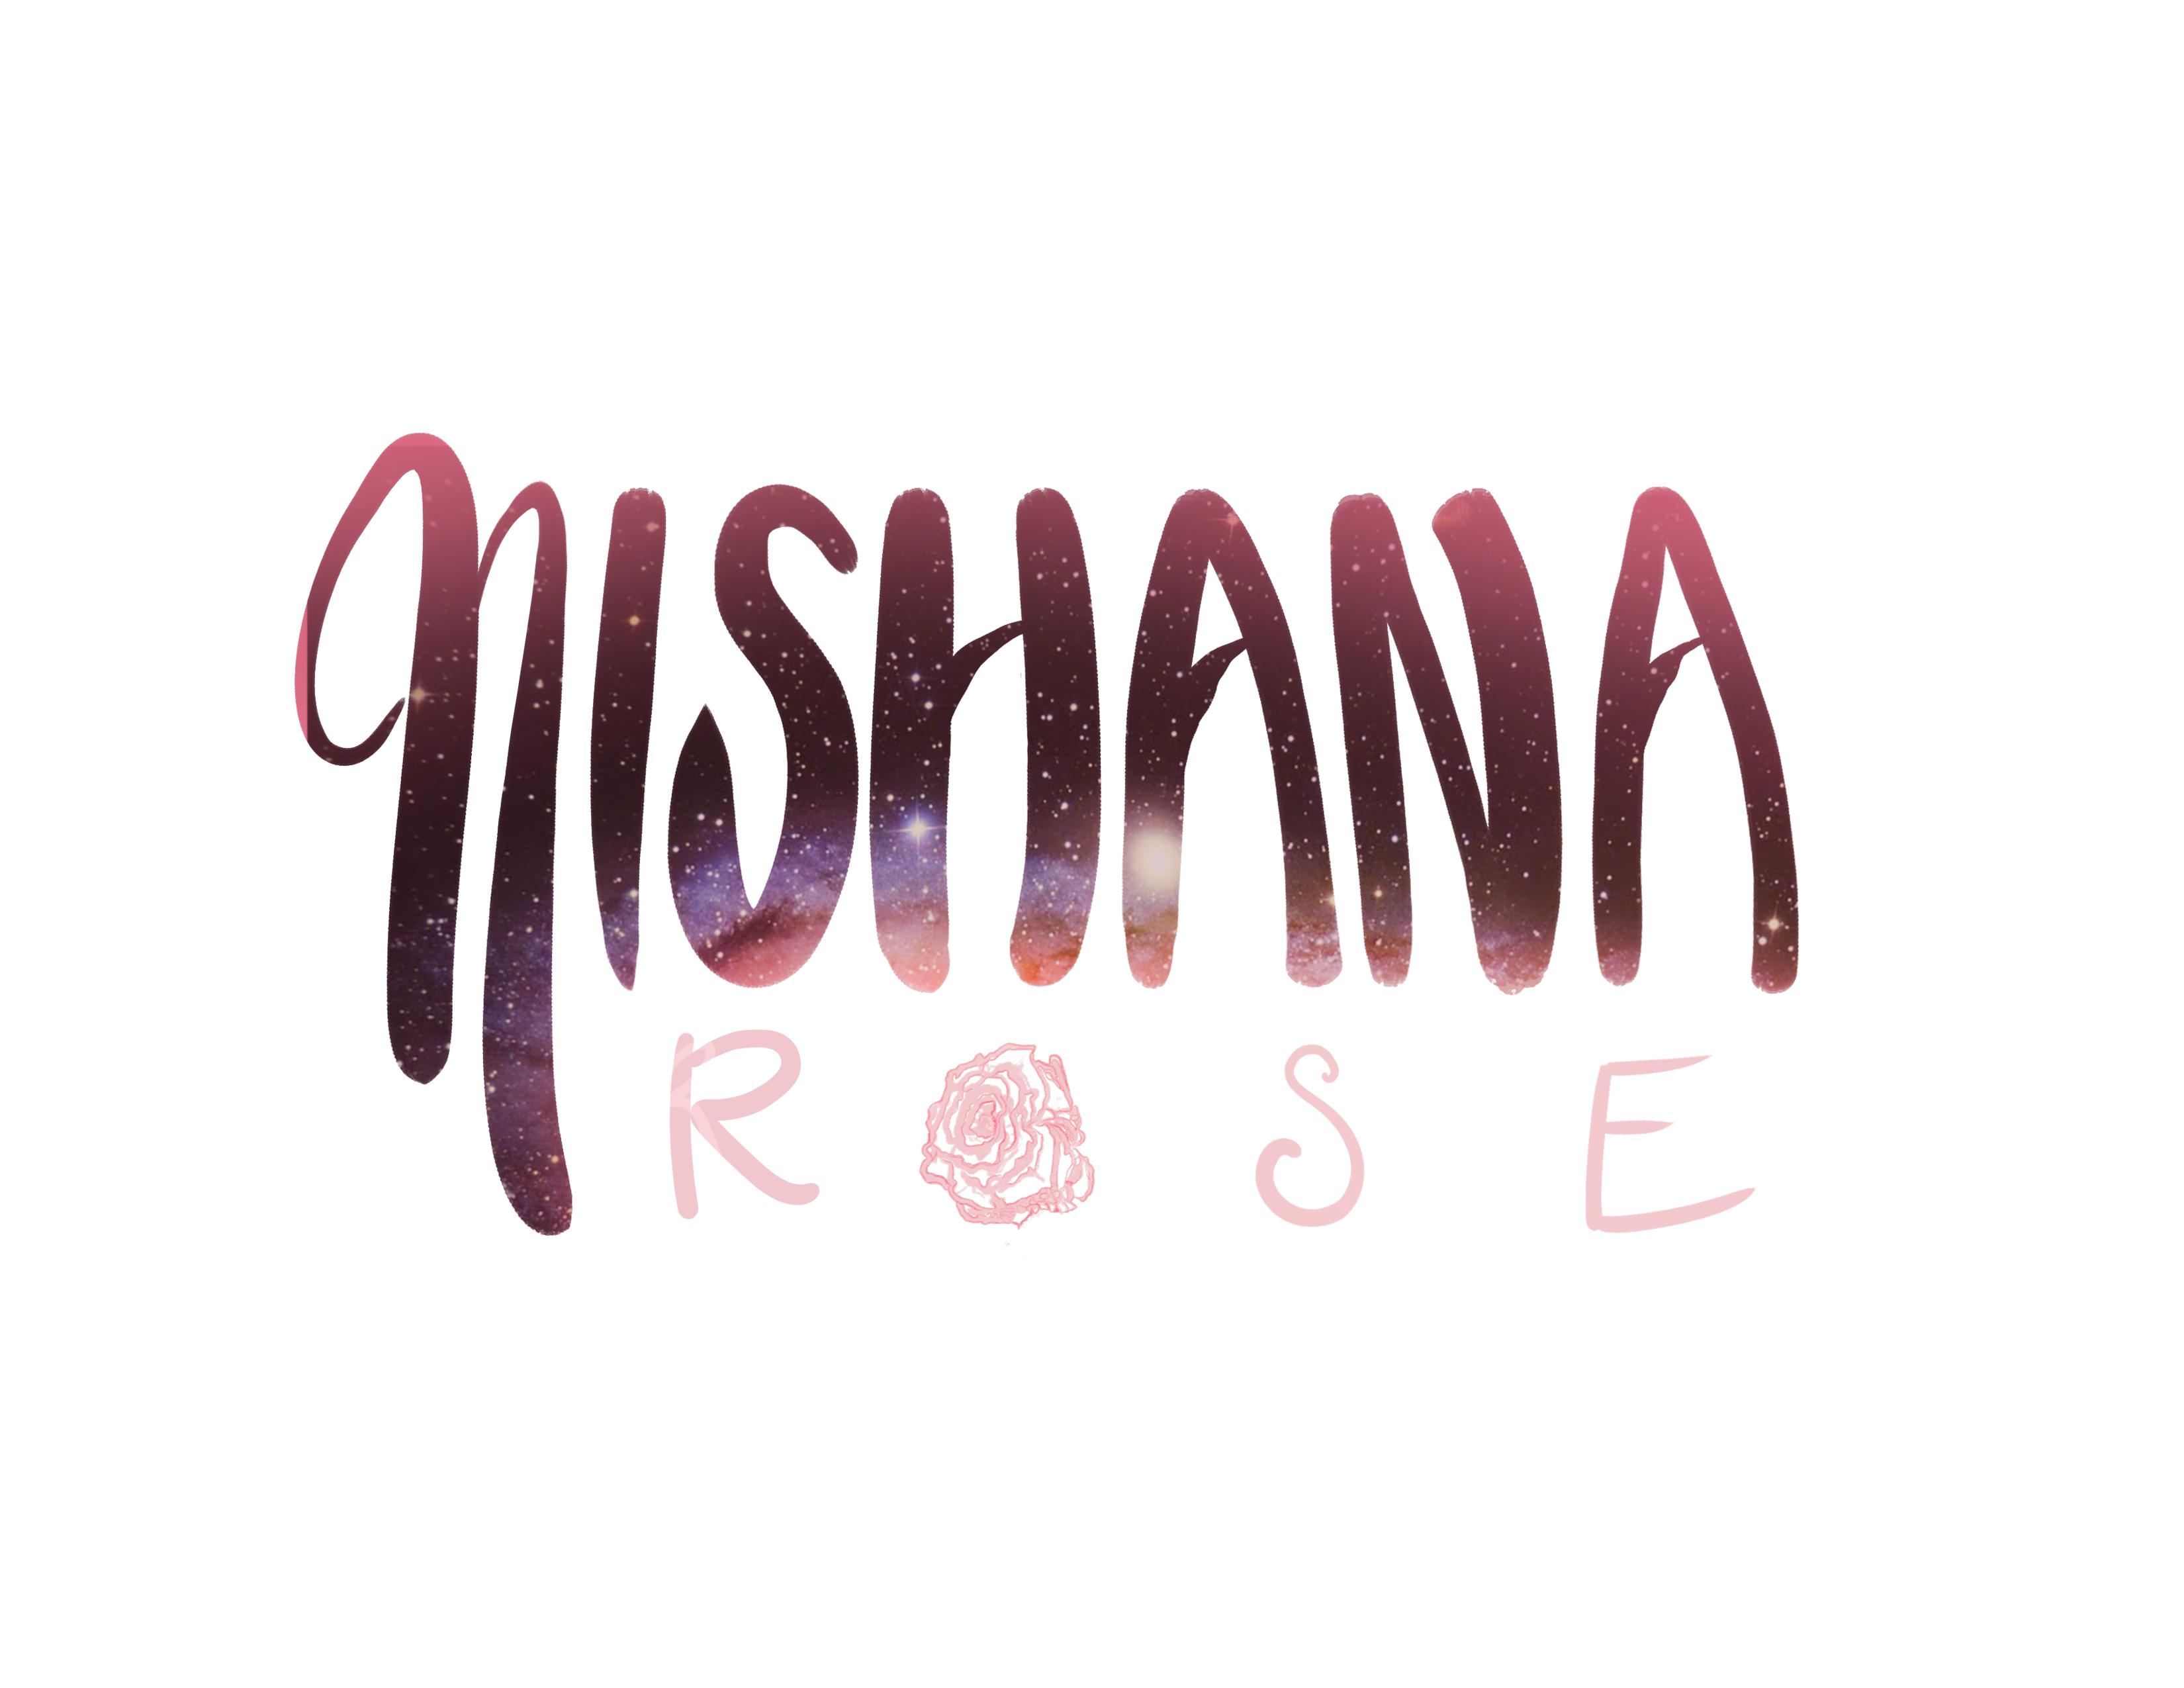 NishanaRoseLogo4